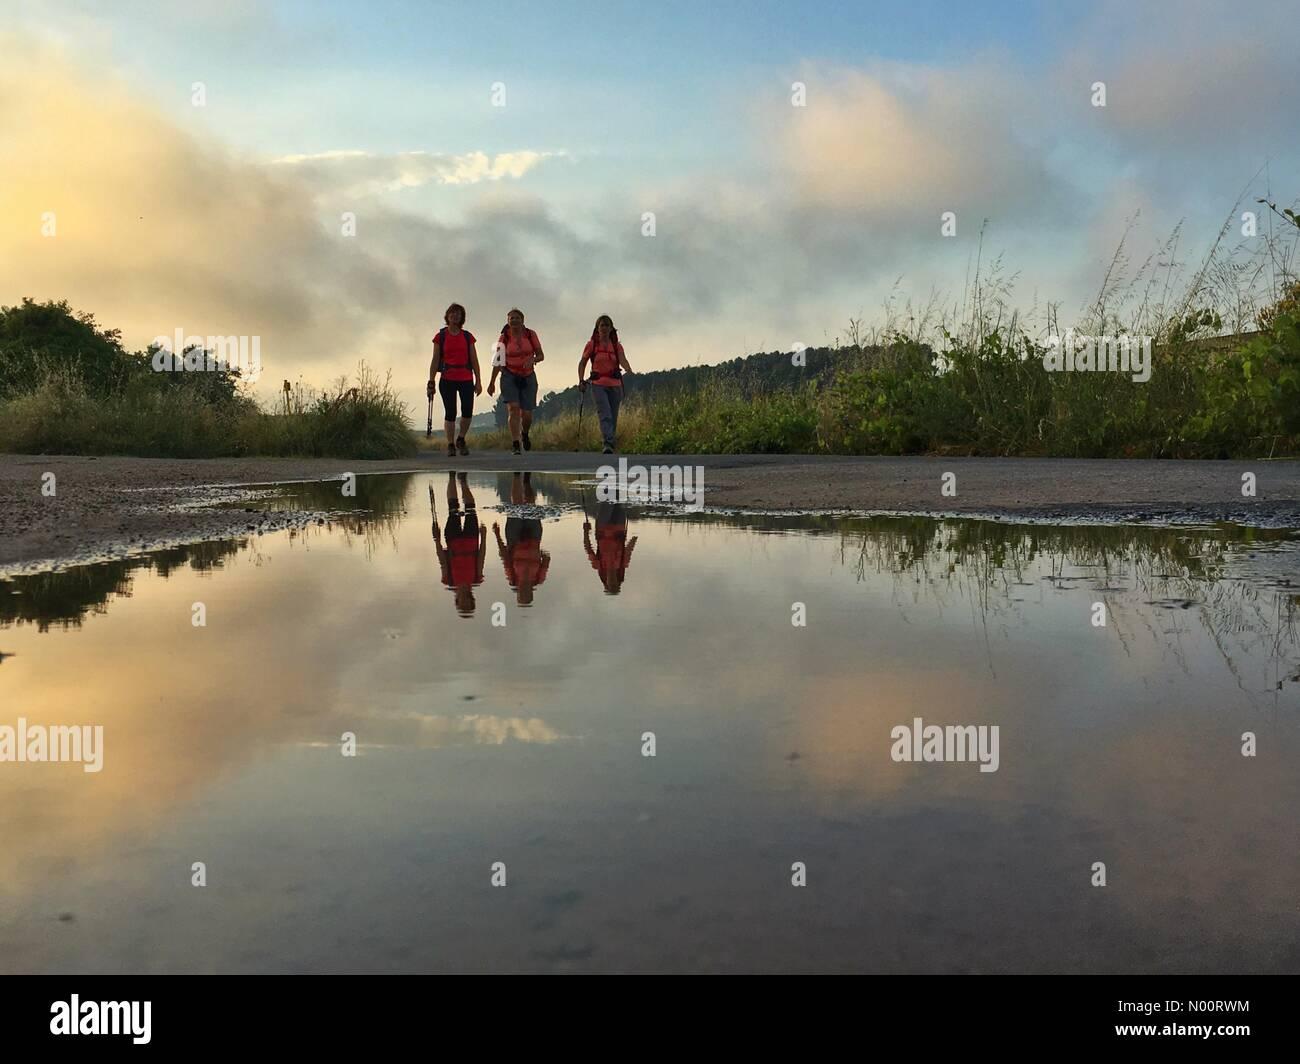 37, Azofra, La Rioja, Spain. 30th June, 2018. Mirror hiking at sunset in Azofra, Spain. Credit: Pierangelo Orizio/StockimoNews/Alamy Live News - Stock Image